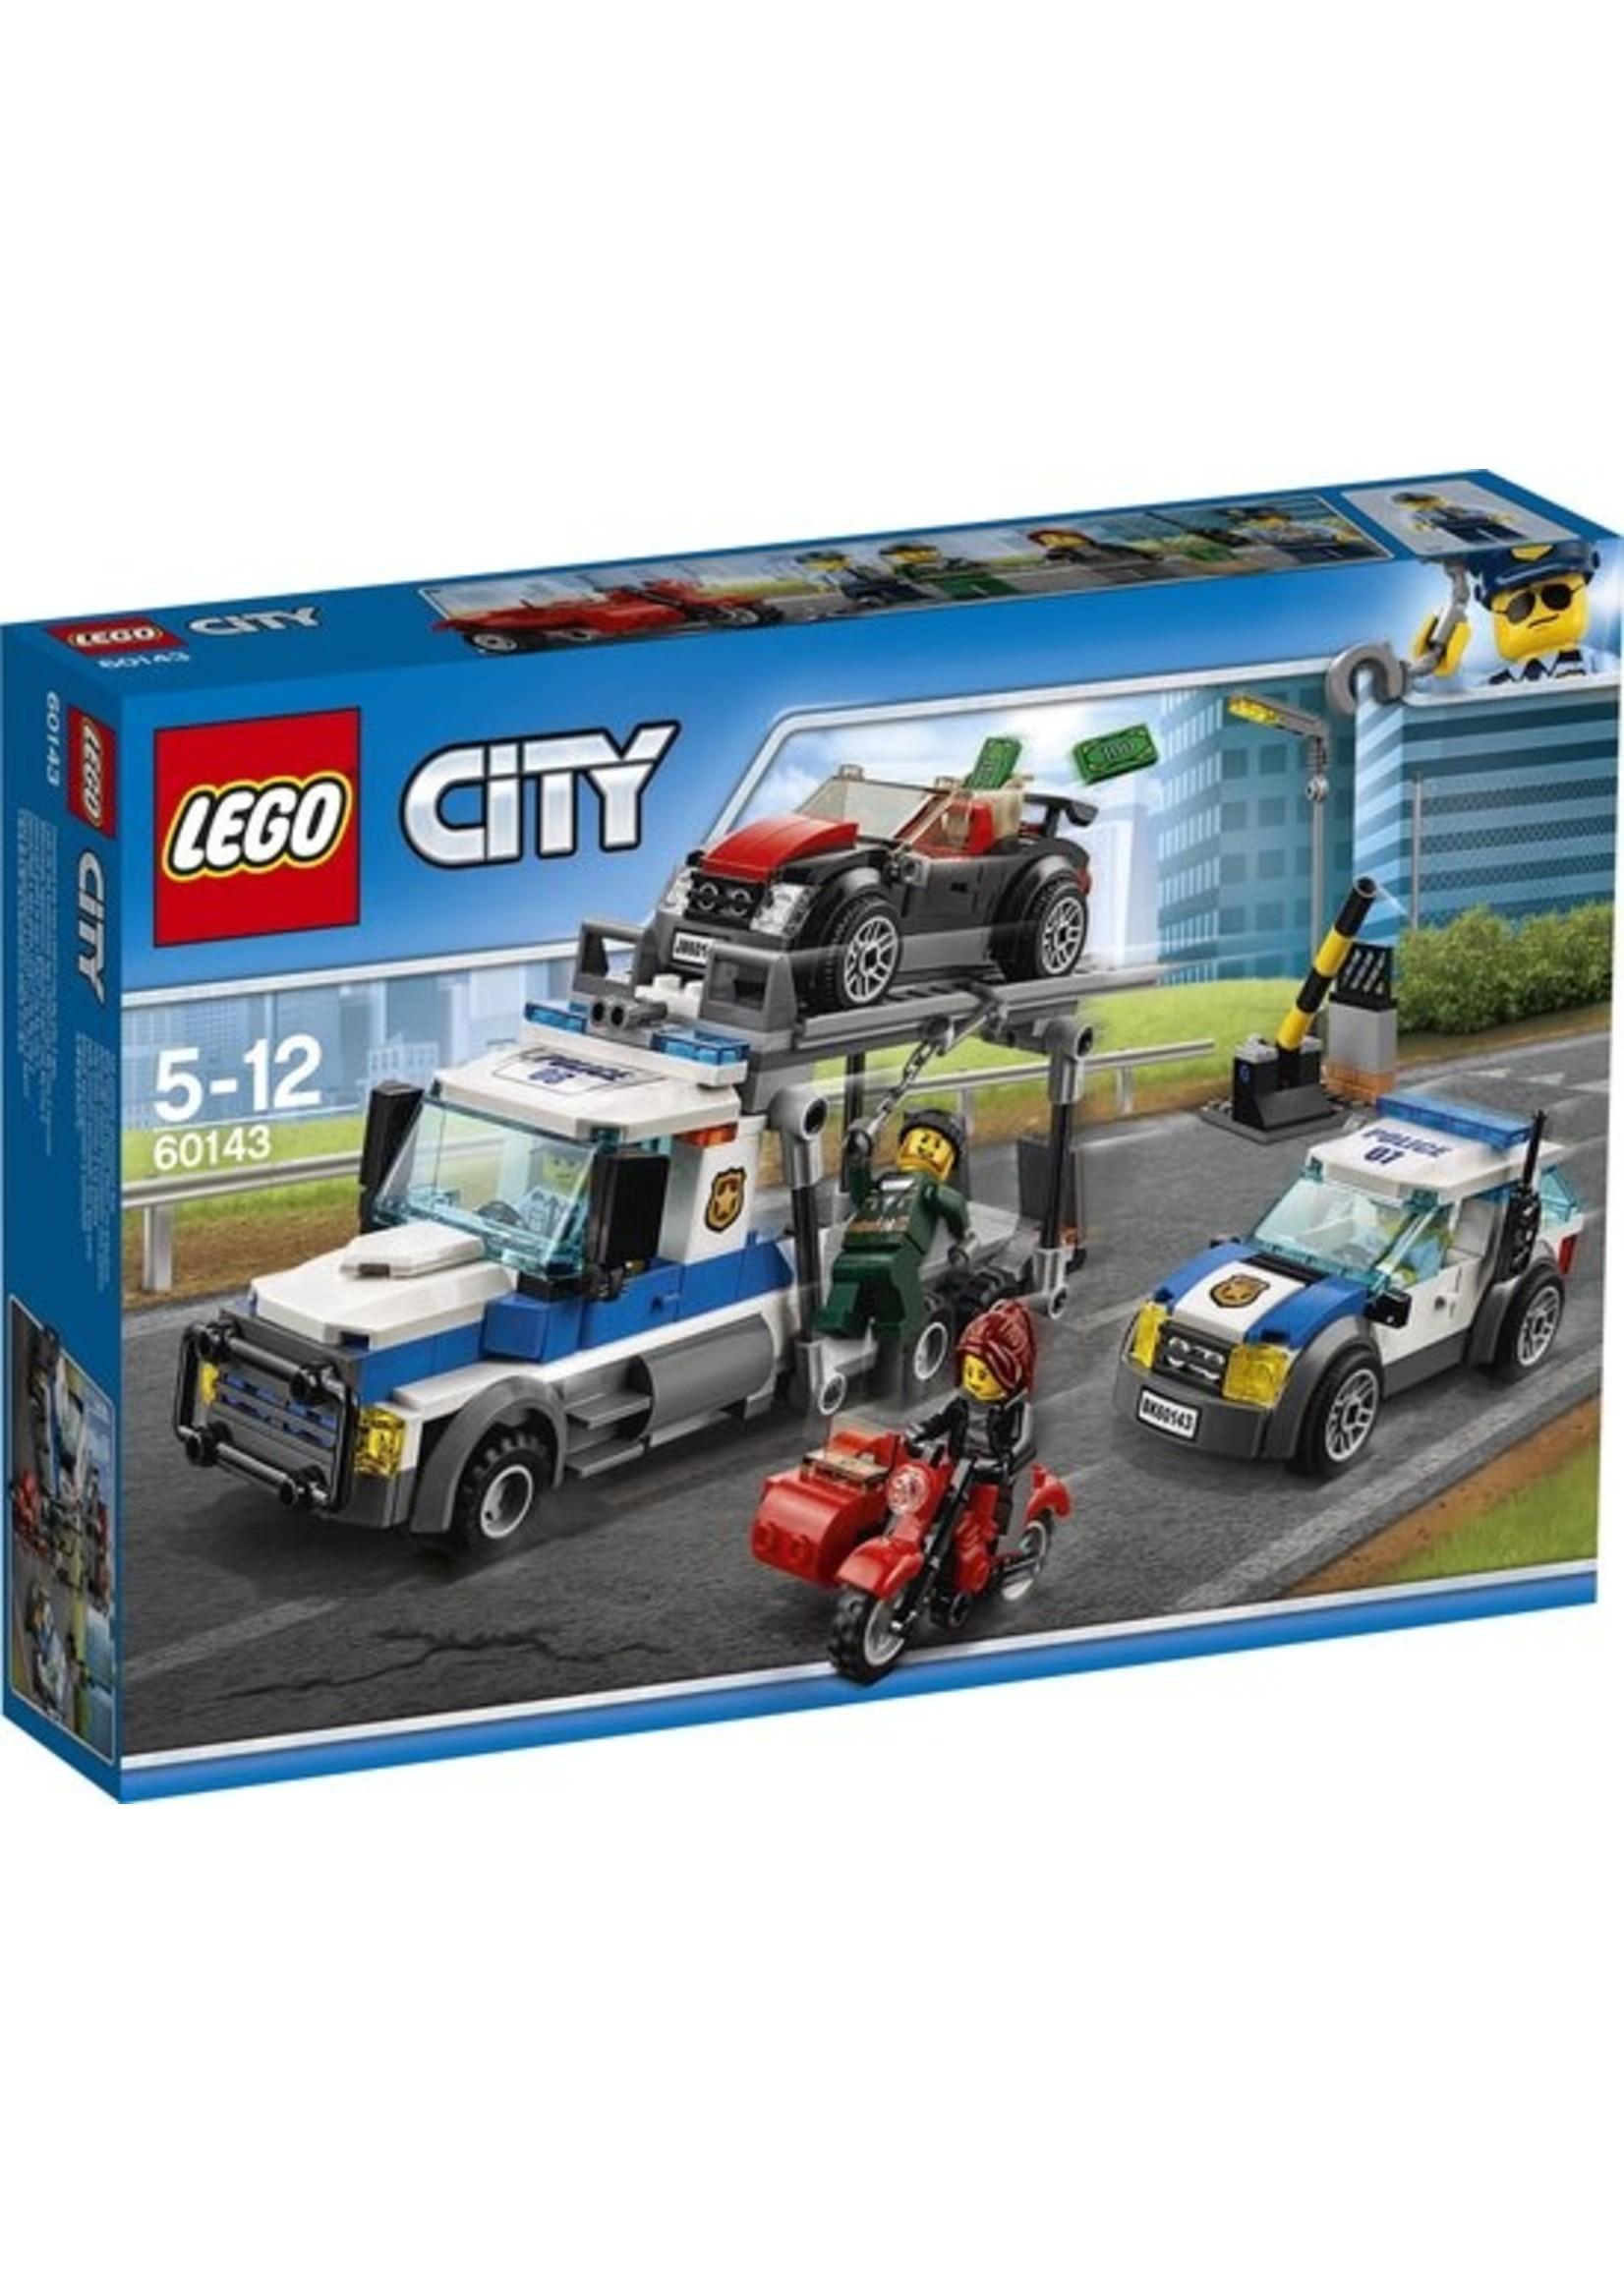 LEGO City Auto Transport Heist - 60143